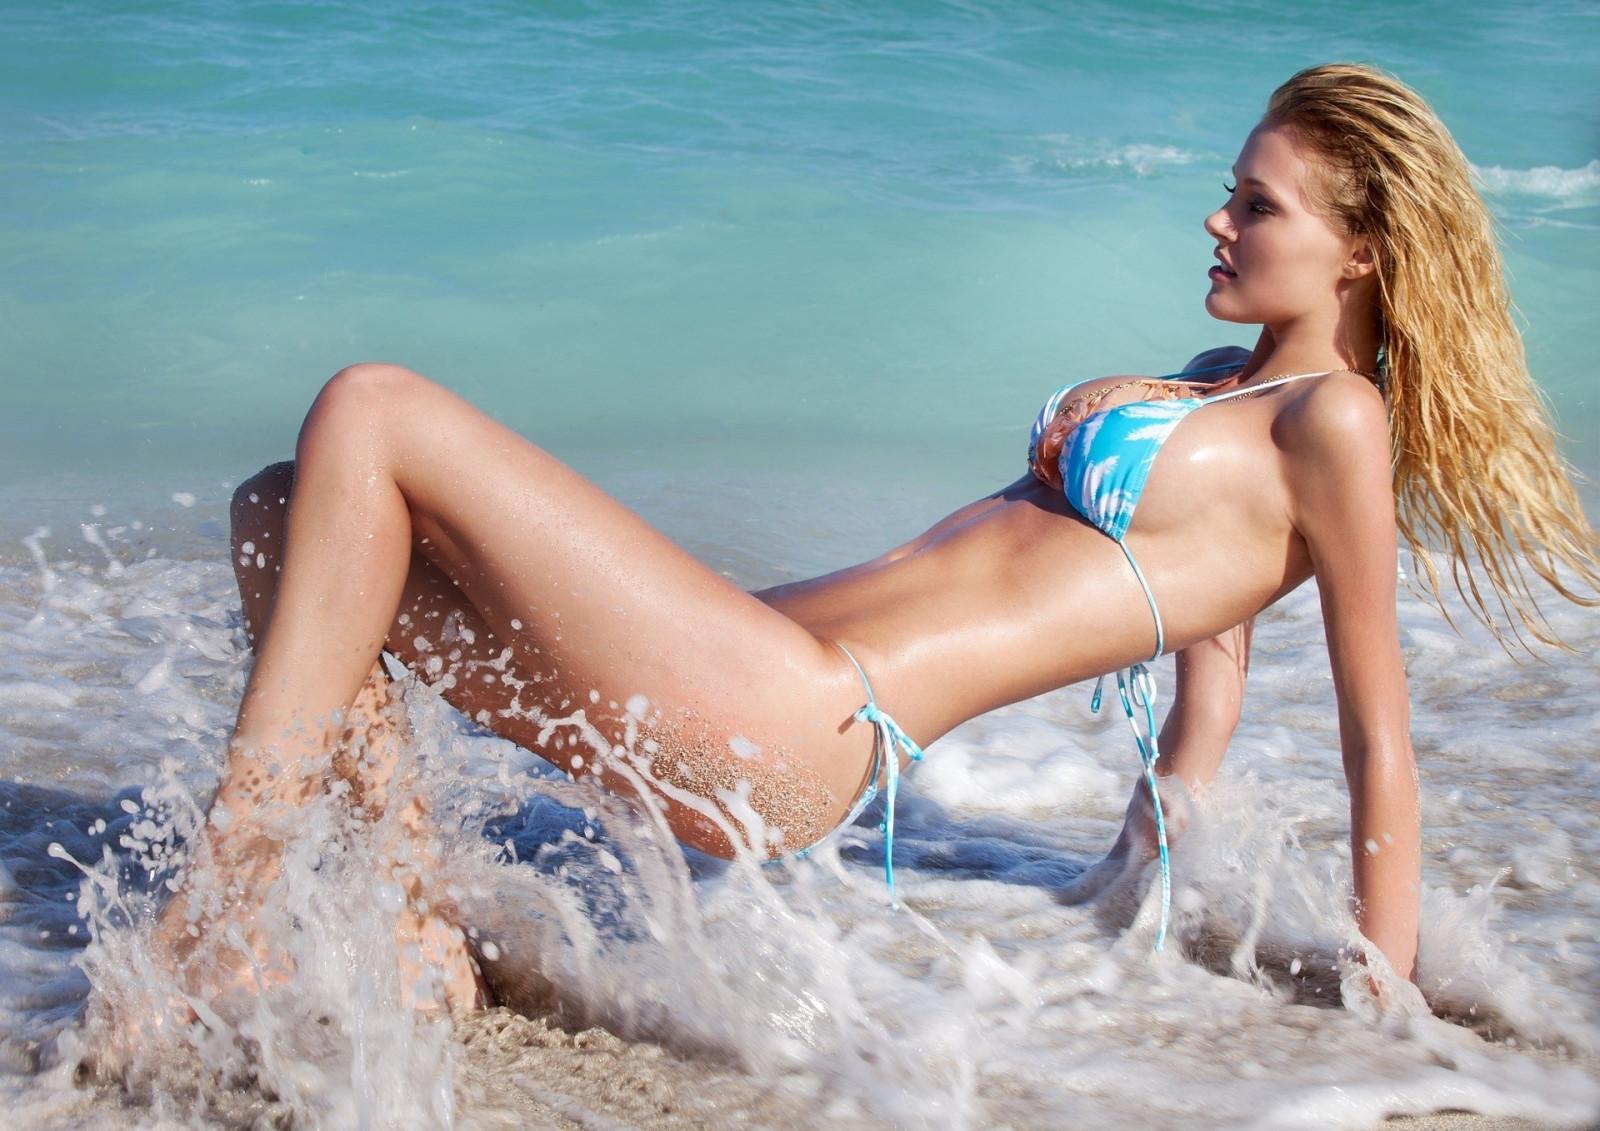 Barrino nude bikini in in photo women beach girls man die